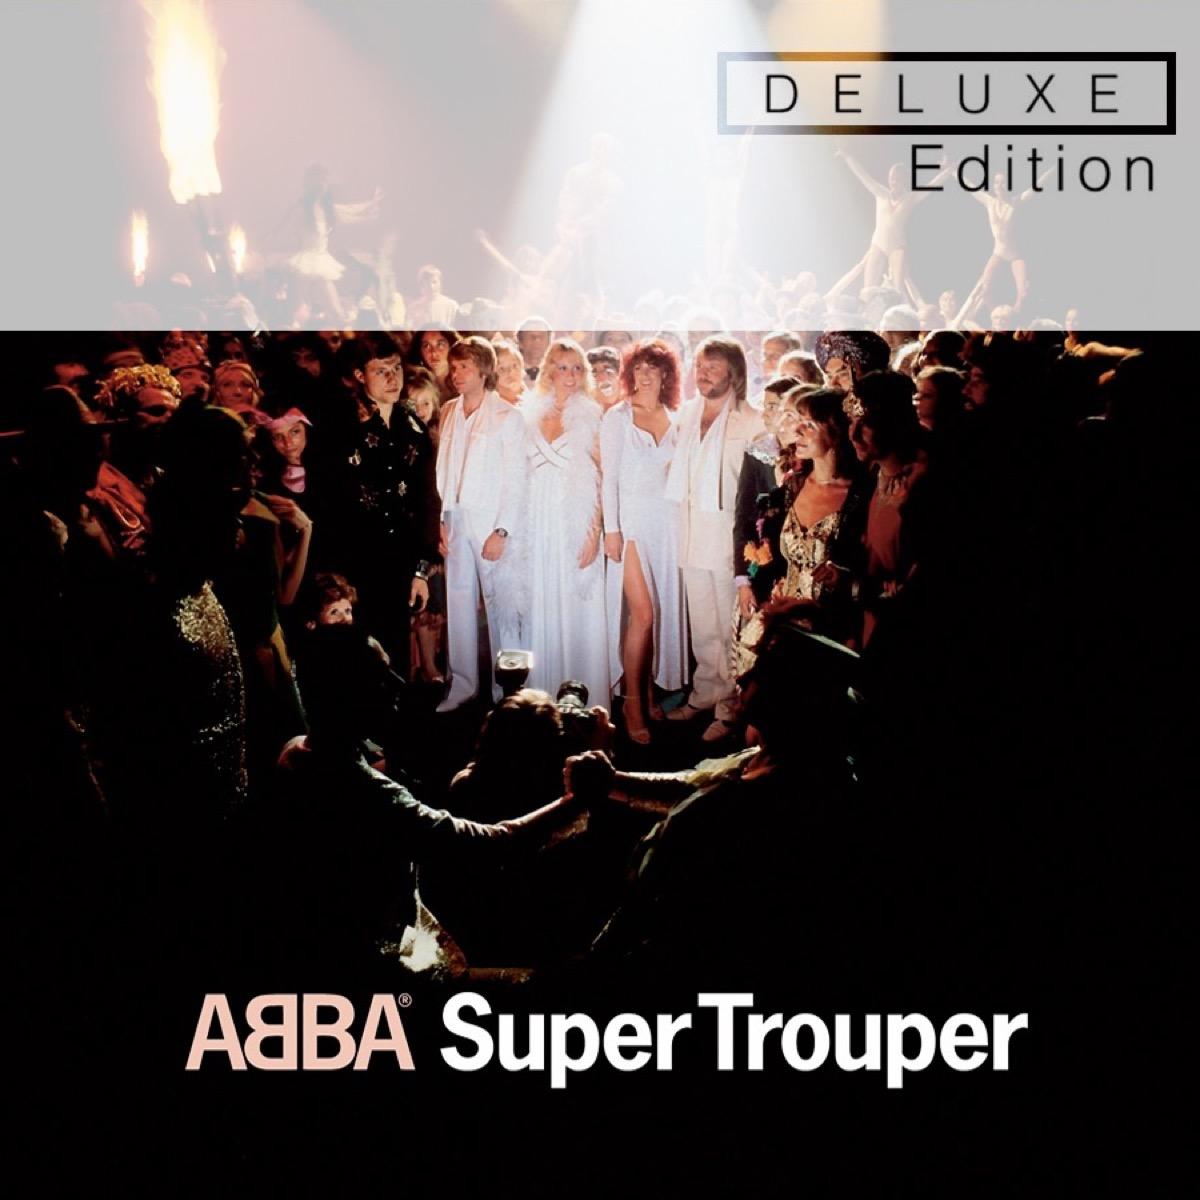 Super Trouper by ABBA